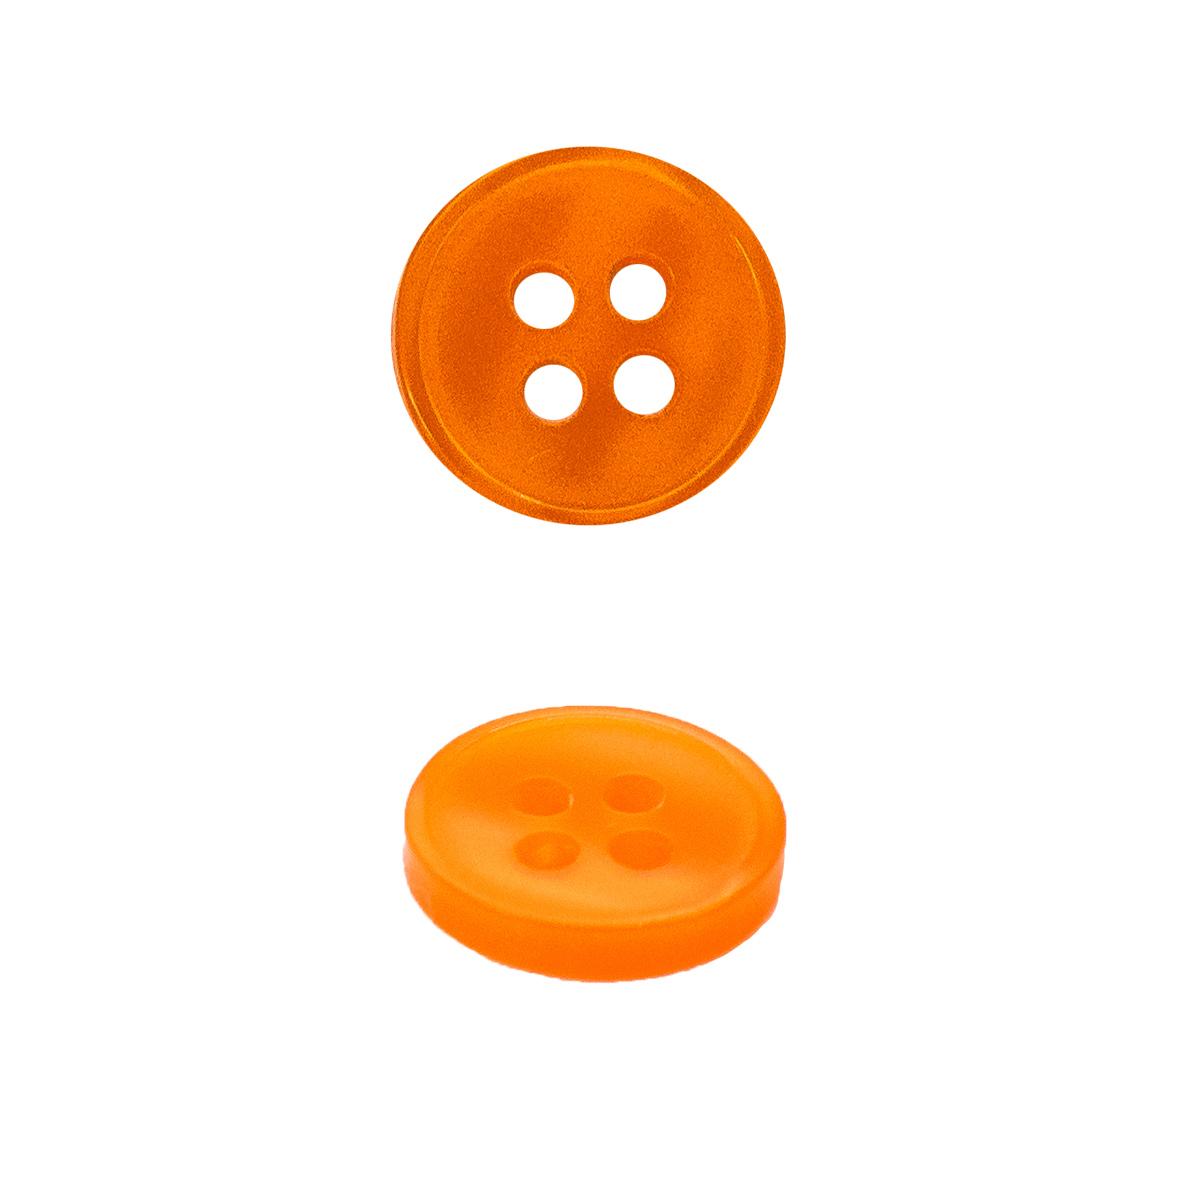 Пуговица на прокол 18L, цв. оранжевый, 15 шт/упак